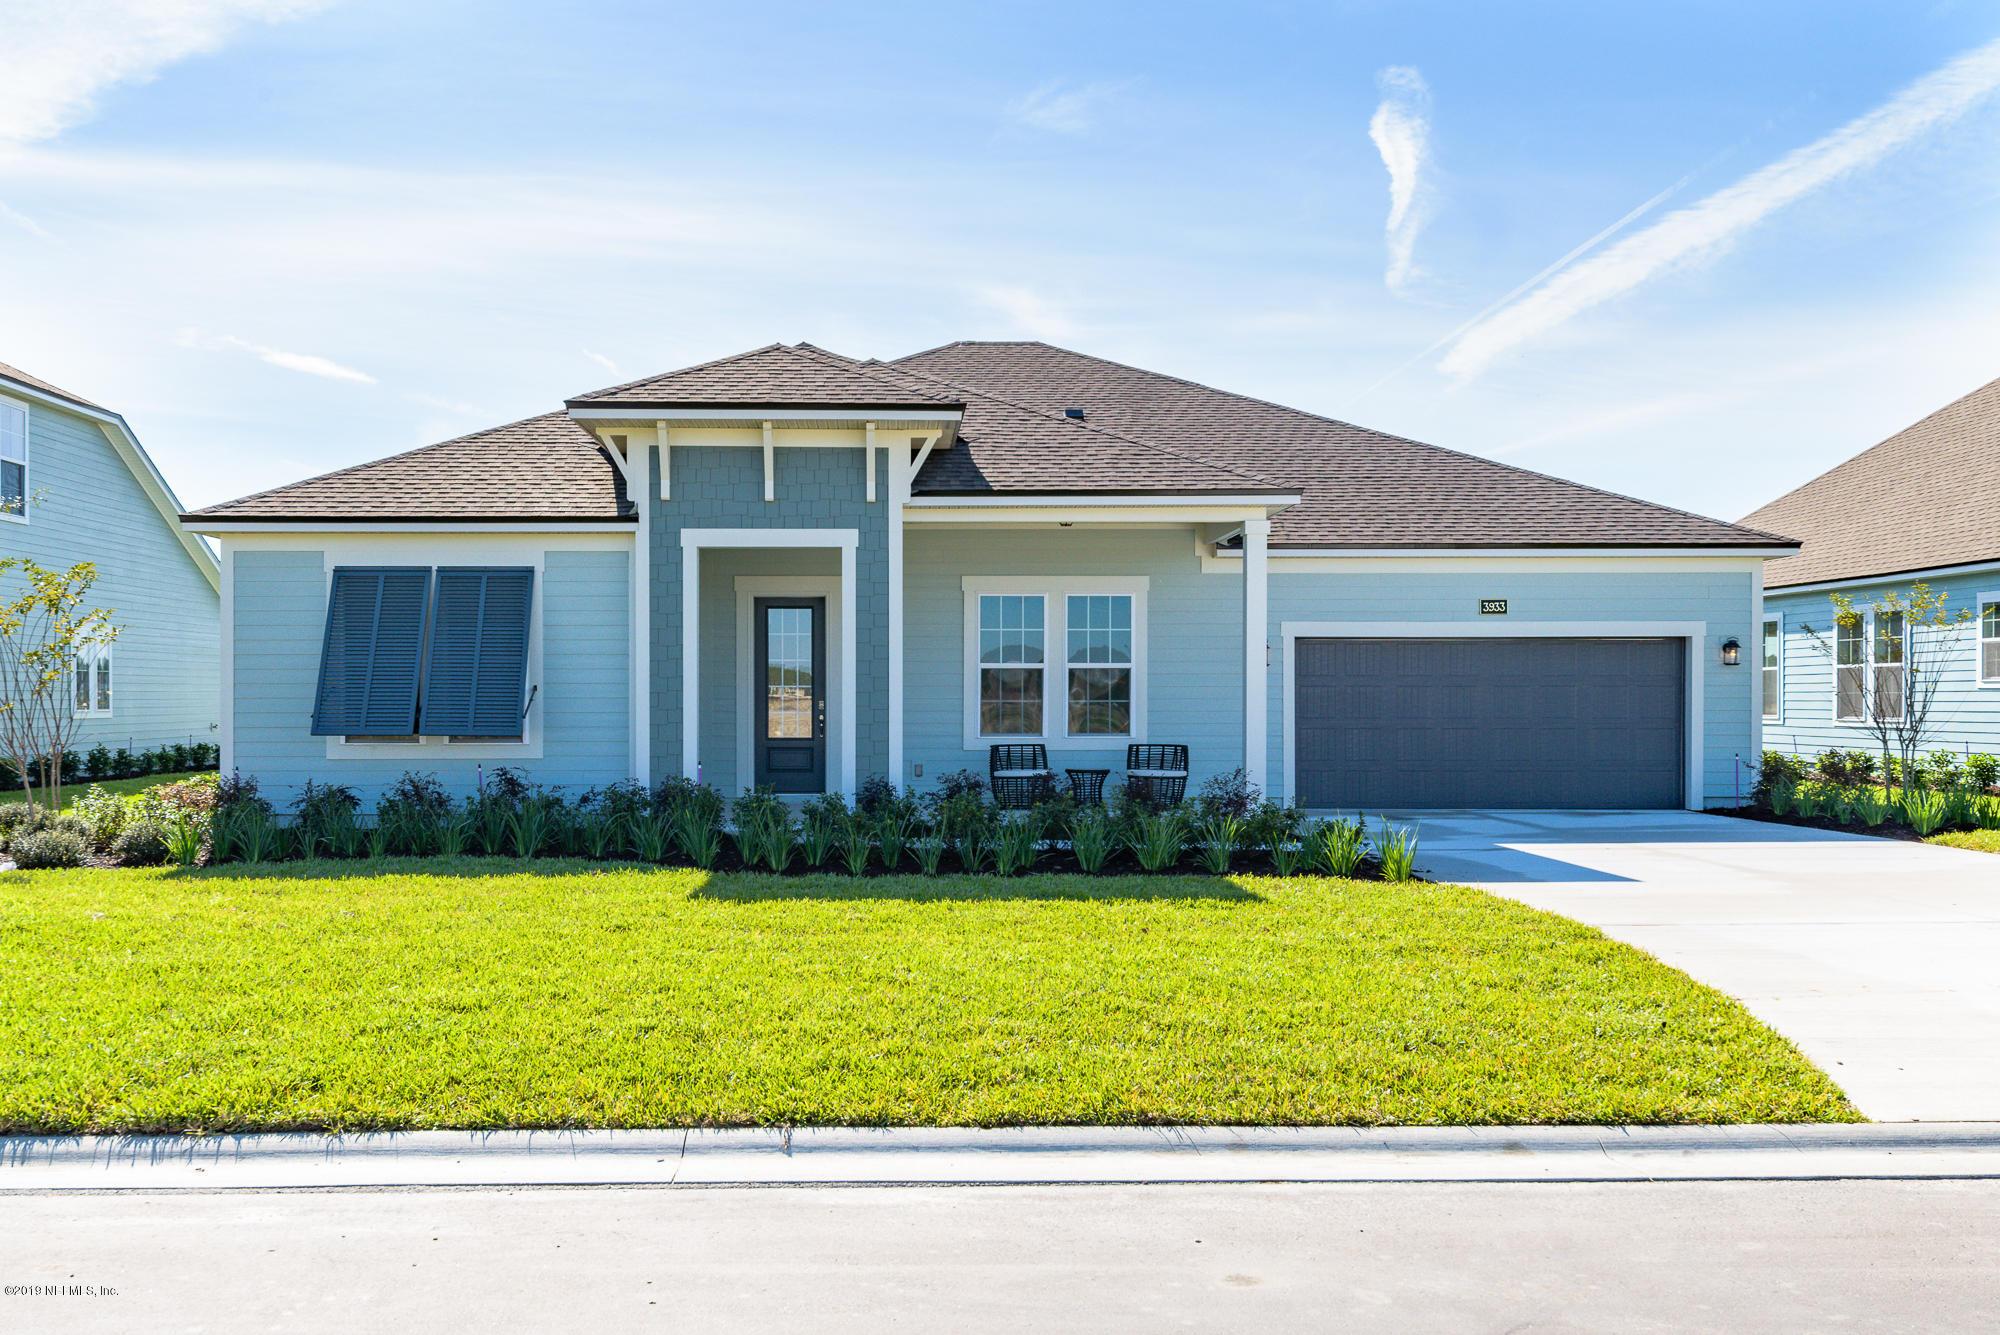 3933 SPYGLASS HILL, ORANGE PARK, FLORIDA 32065, 3 Bedrooms Bedrooms, ,2 BathroomsBathrooms,Residential - single family,For sale,SPYGLASS HILL,1007284